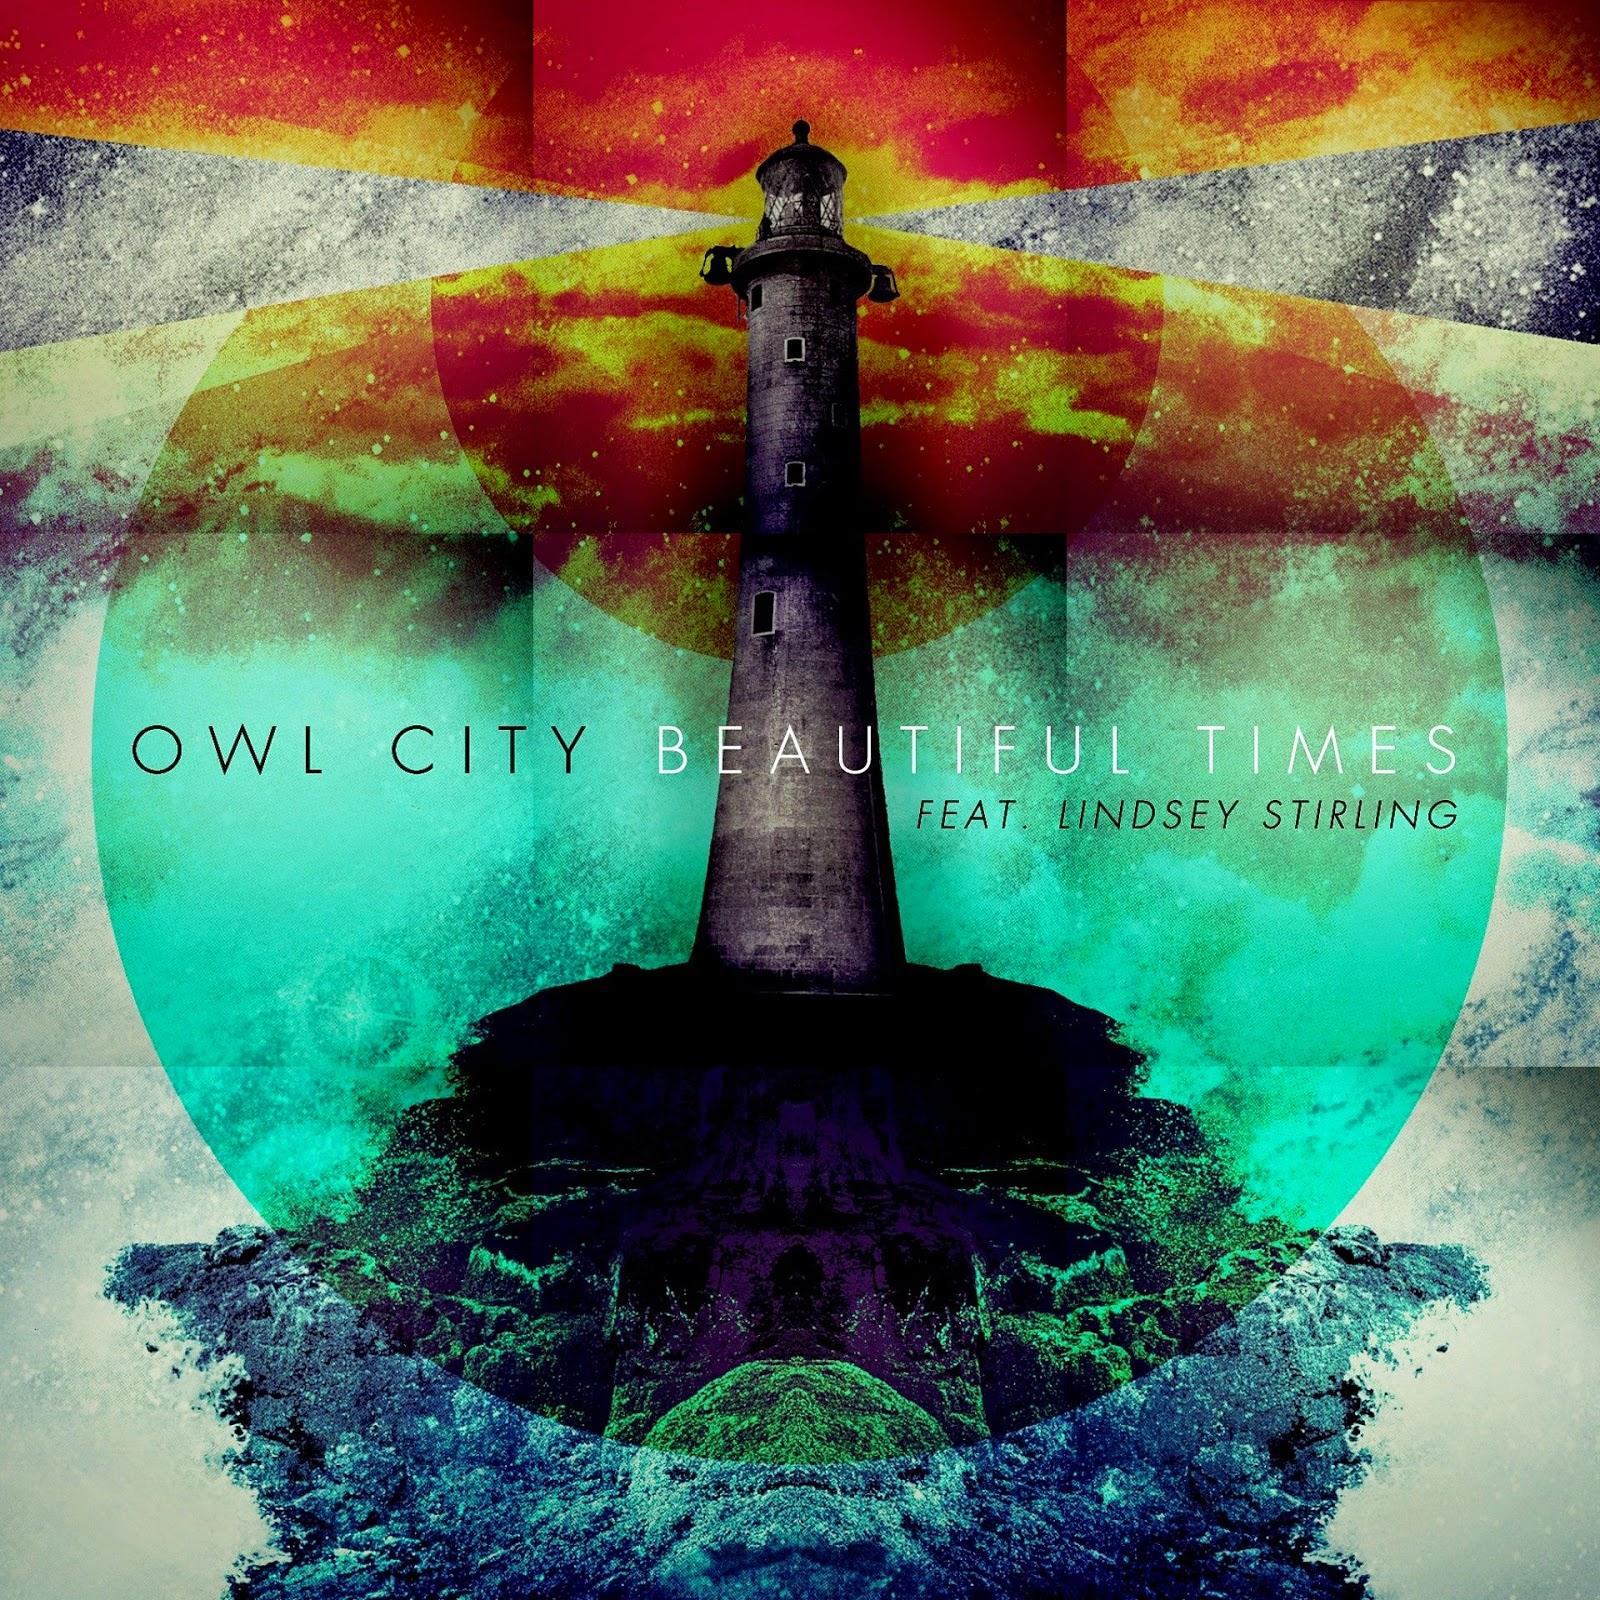 Owl city of june - photo#23